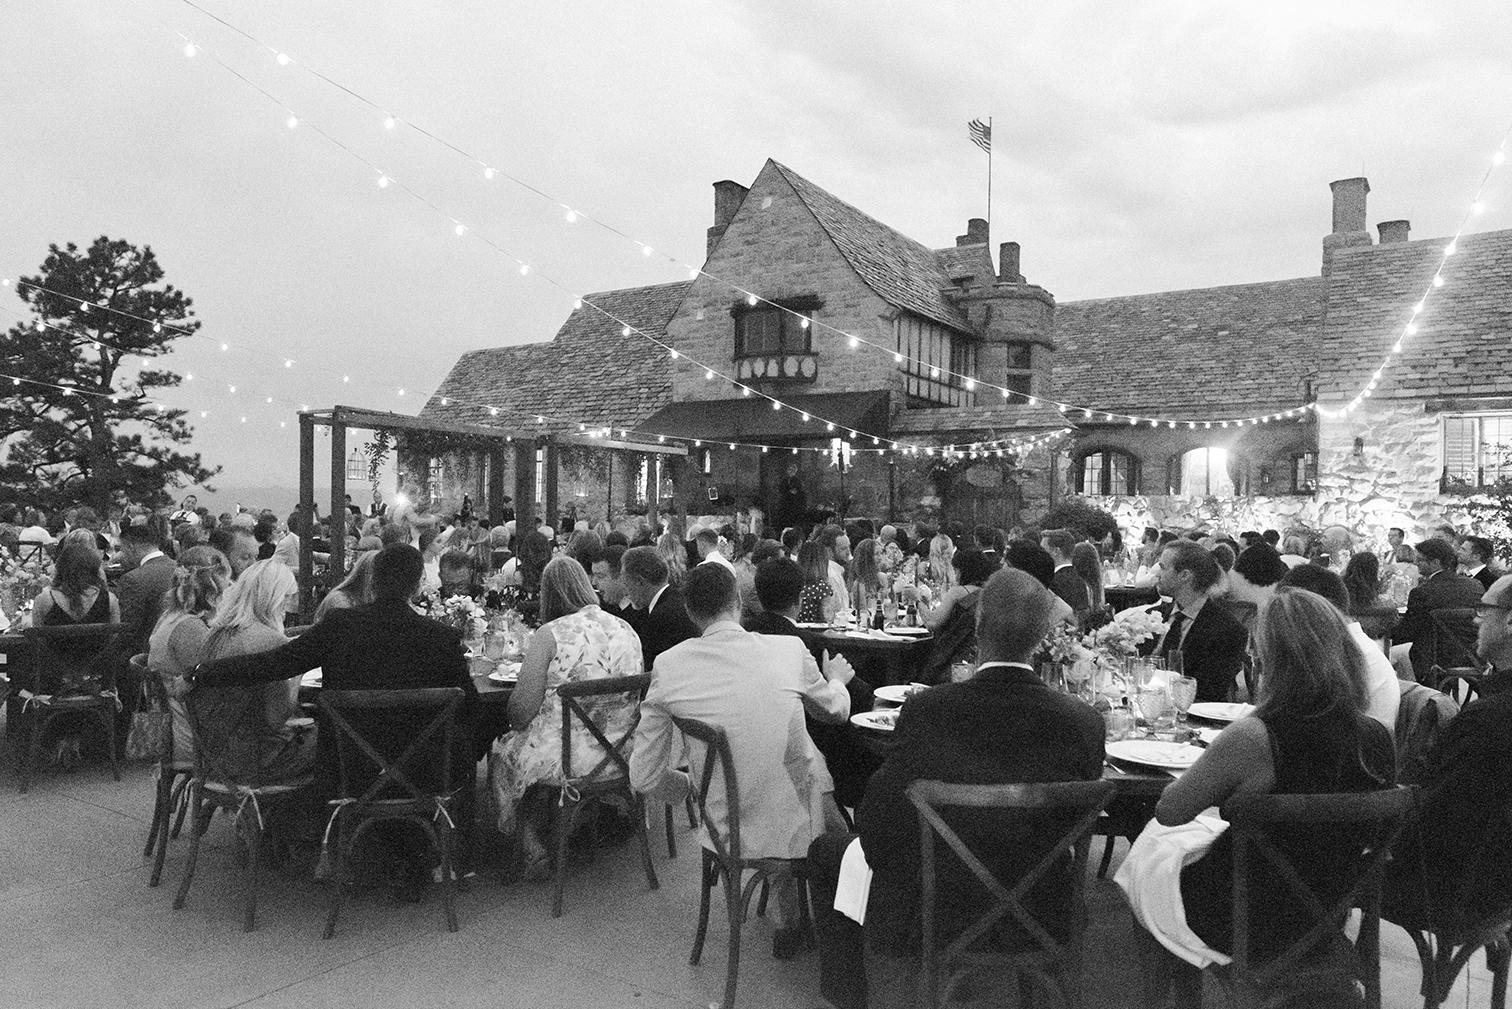 Wedding Photographers Colorado, Planning Your Denver Wedding, Outdoor Receptions, Denver Wedding Photography